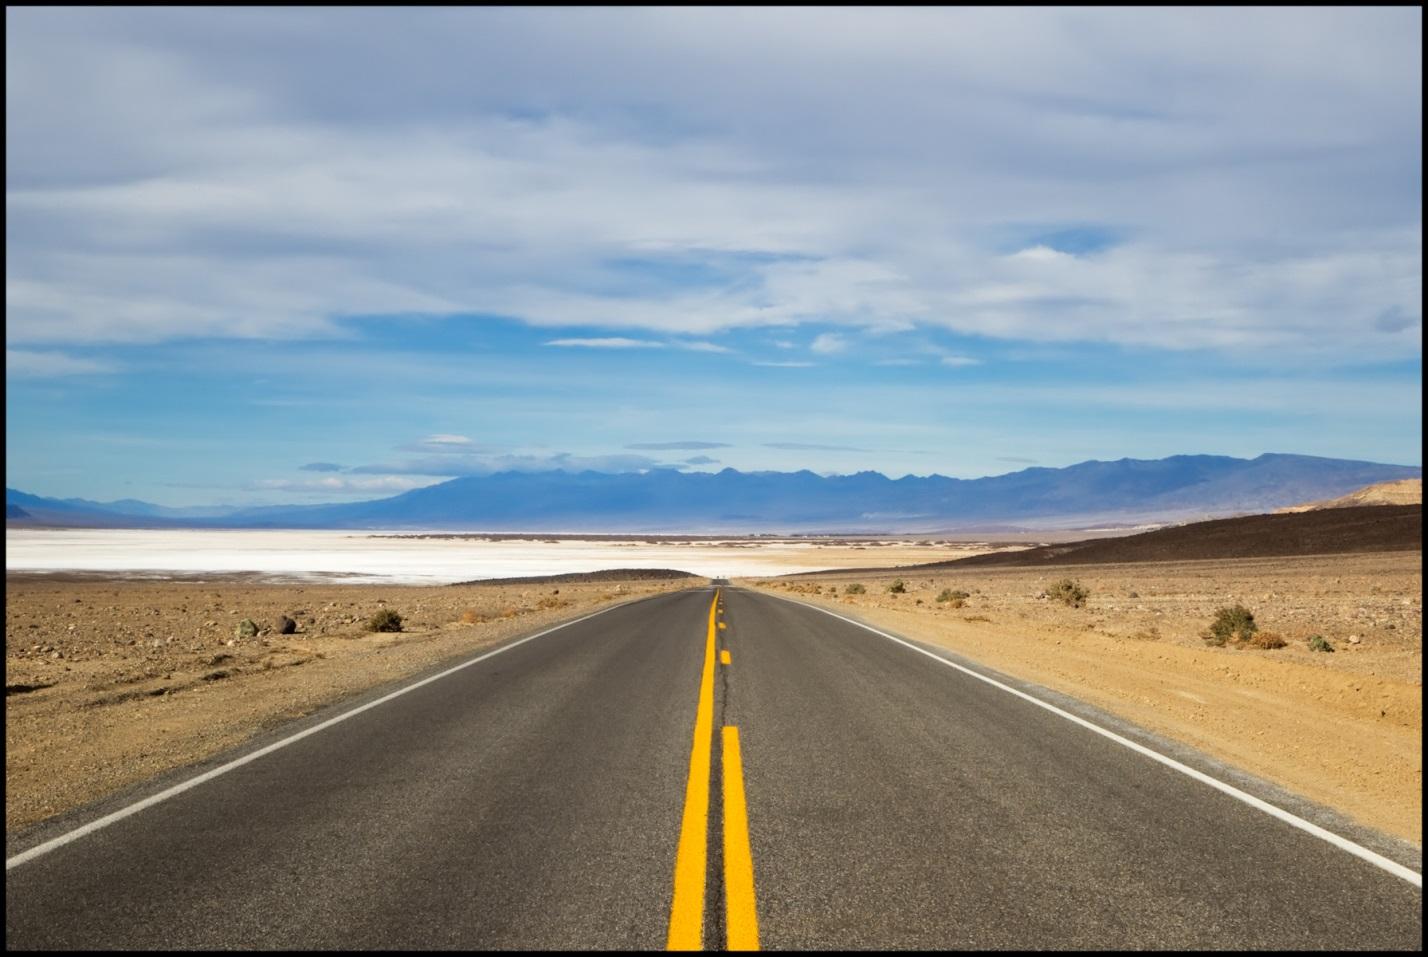 Asphalt roadway near the salt flats of Death Valley National Park